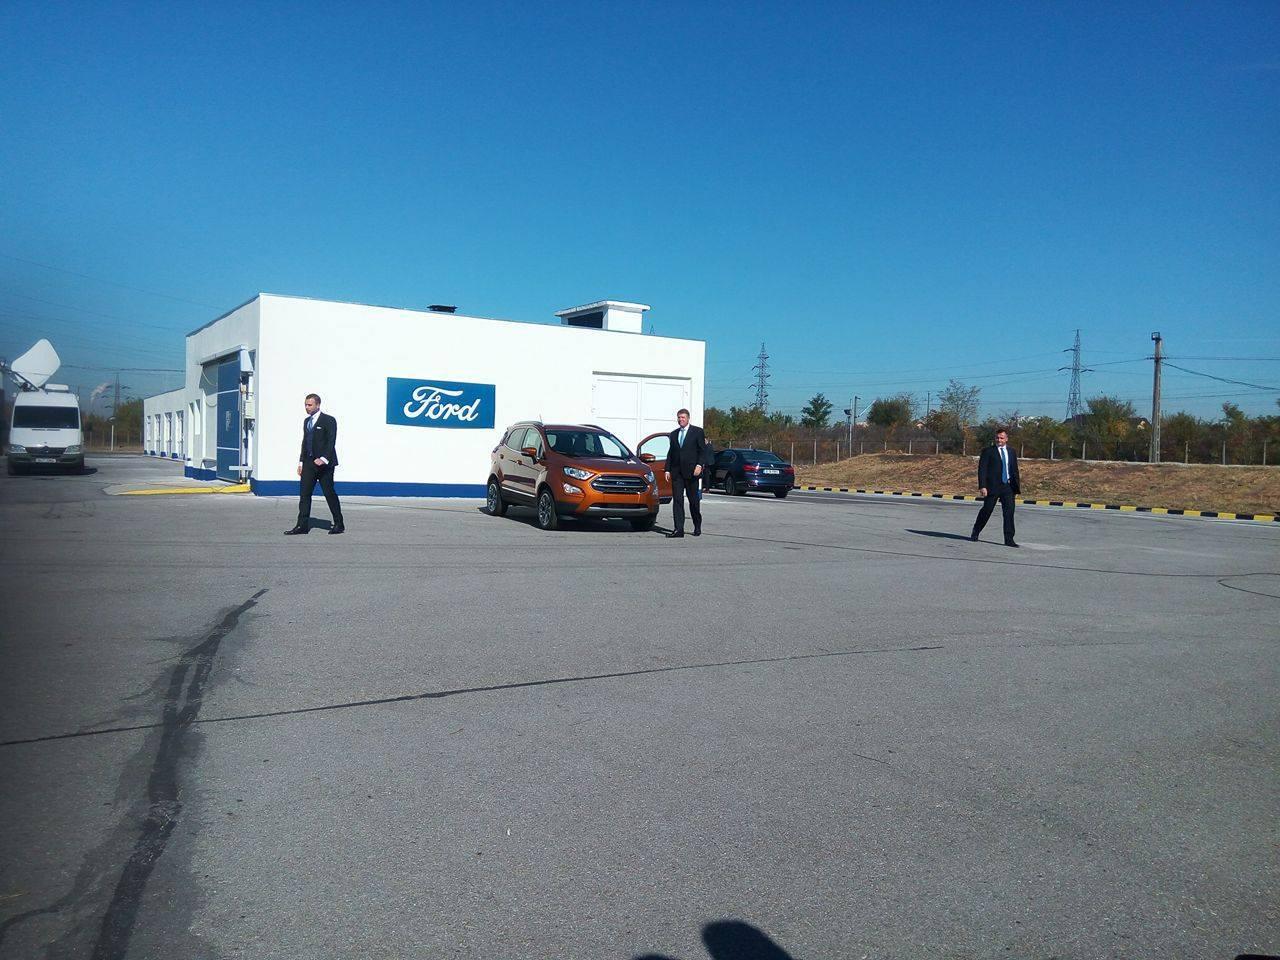 FOTO | Iohannis a făcut, la Craiova, un drivetest cu noul Ford EcoSport